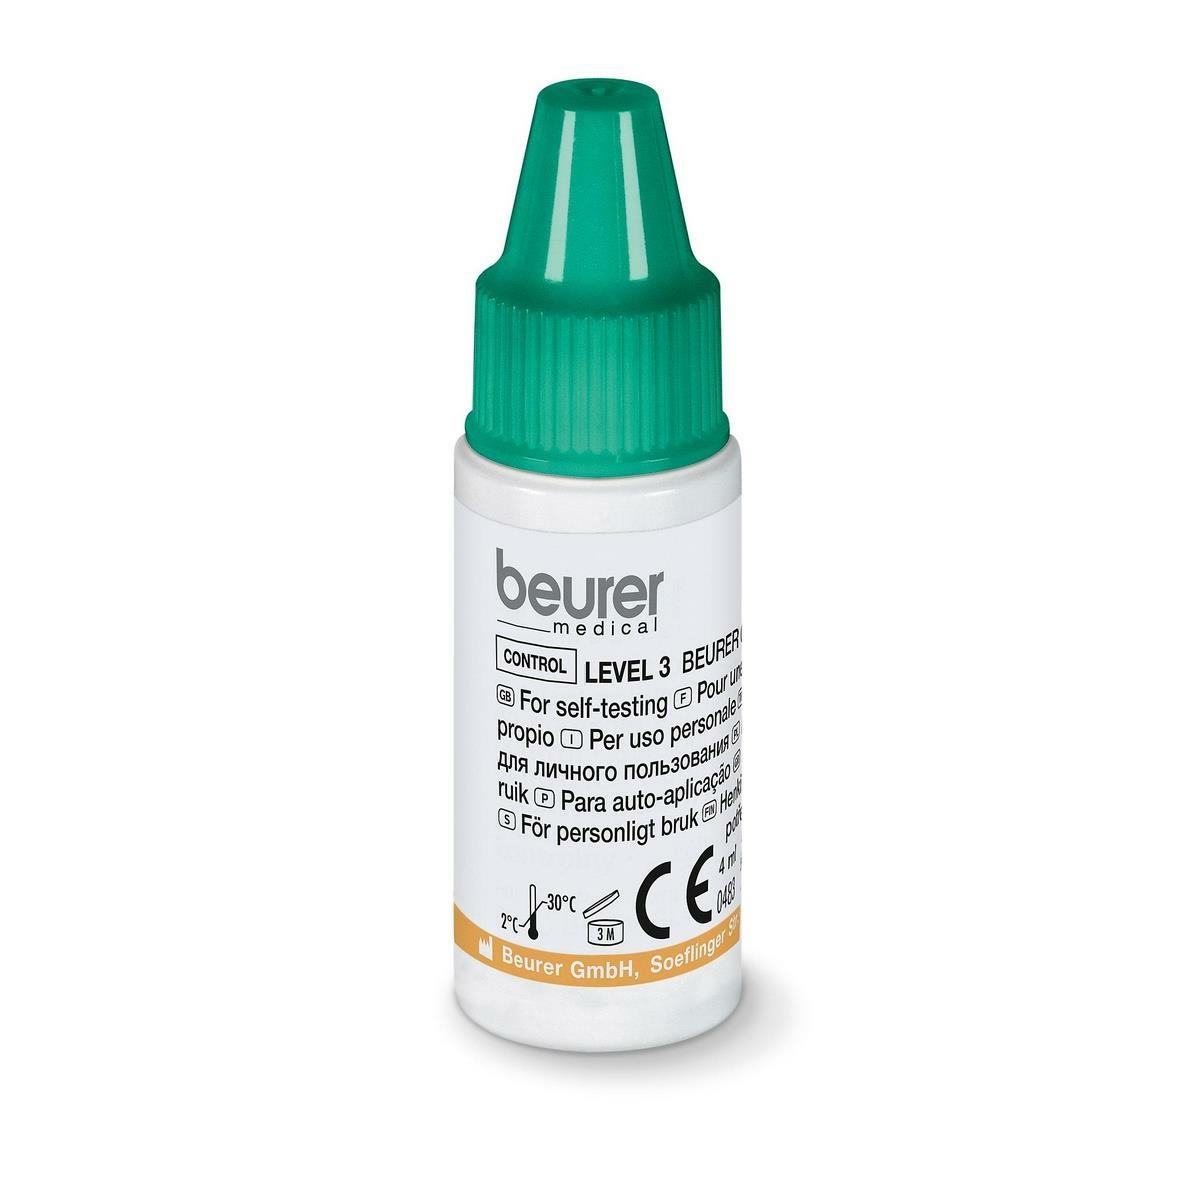 Beurer Kontrolní roztok L3 + L4 pro GL 44 / GL 50, 2x 4 ml